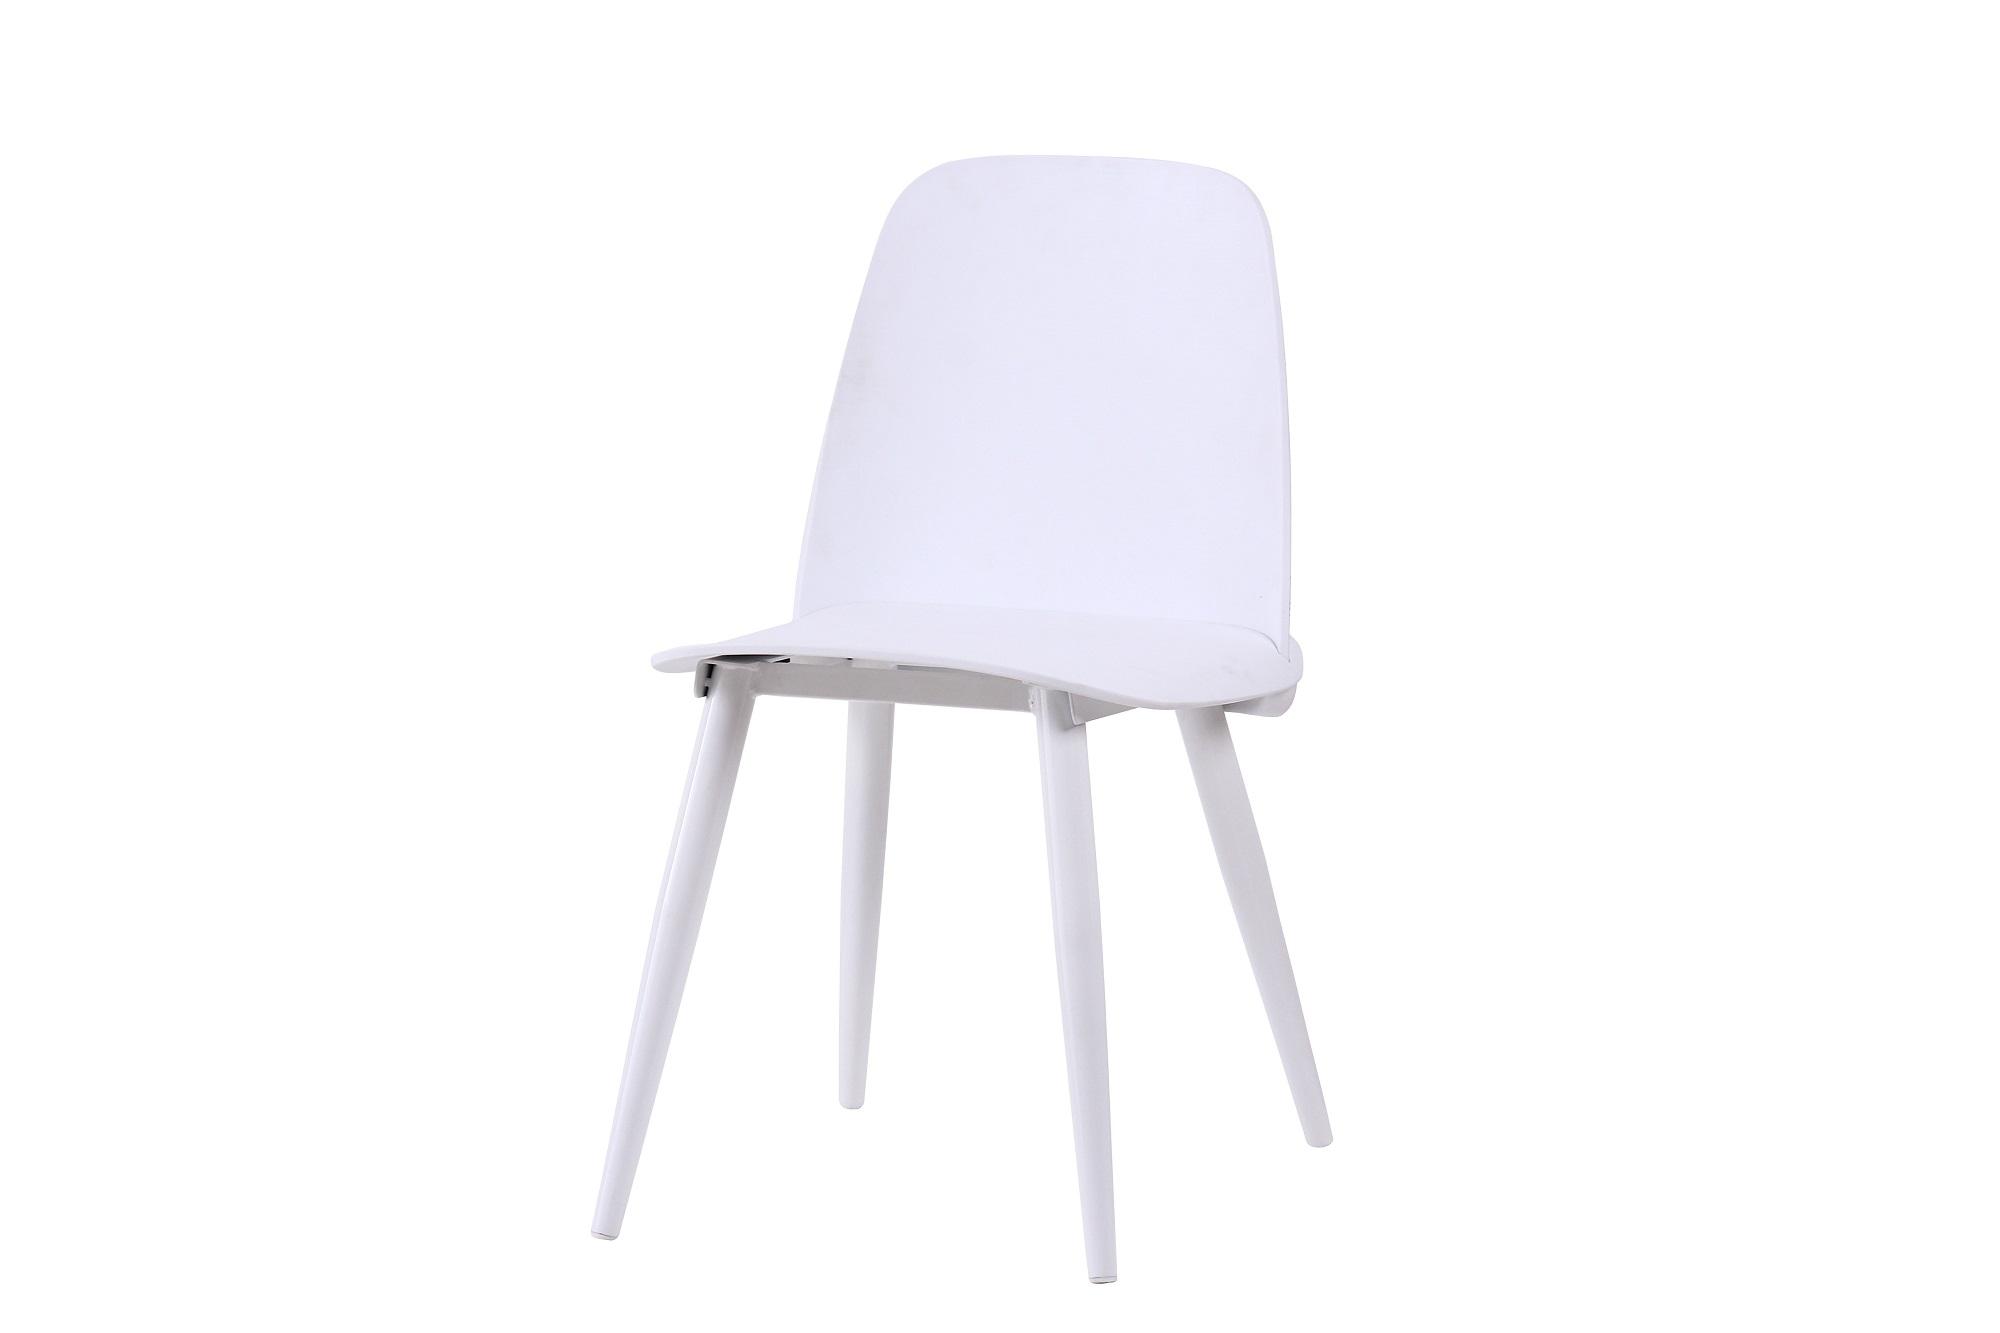 Scaun din plastic cu picioare metalice Sting White l50xA46xH80cm